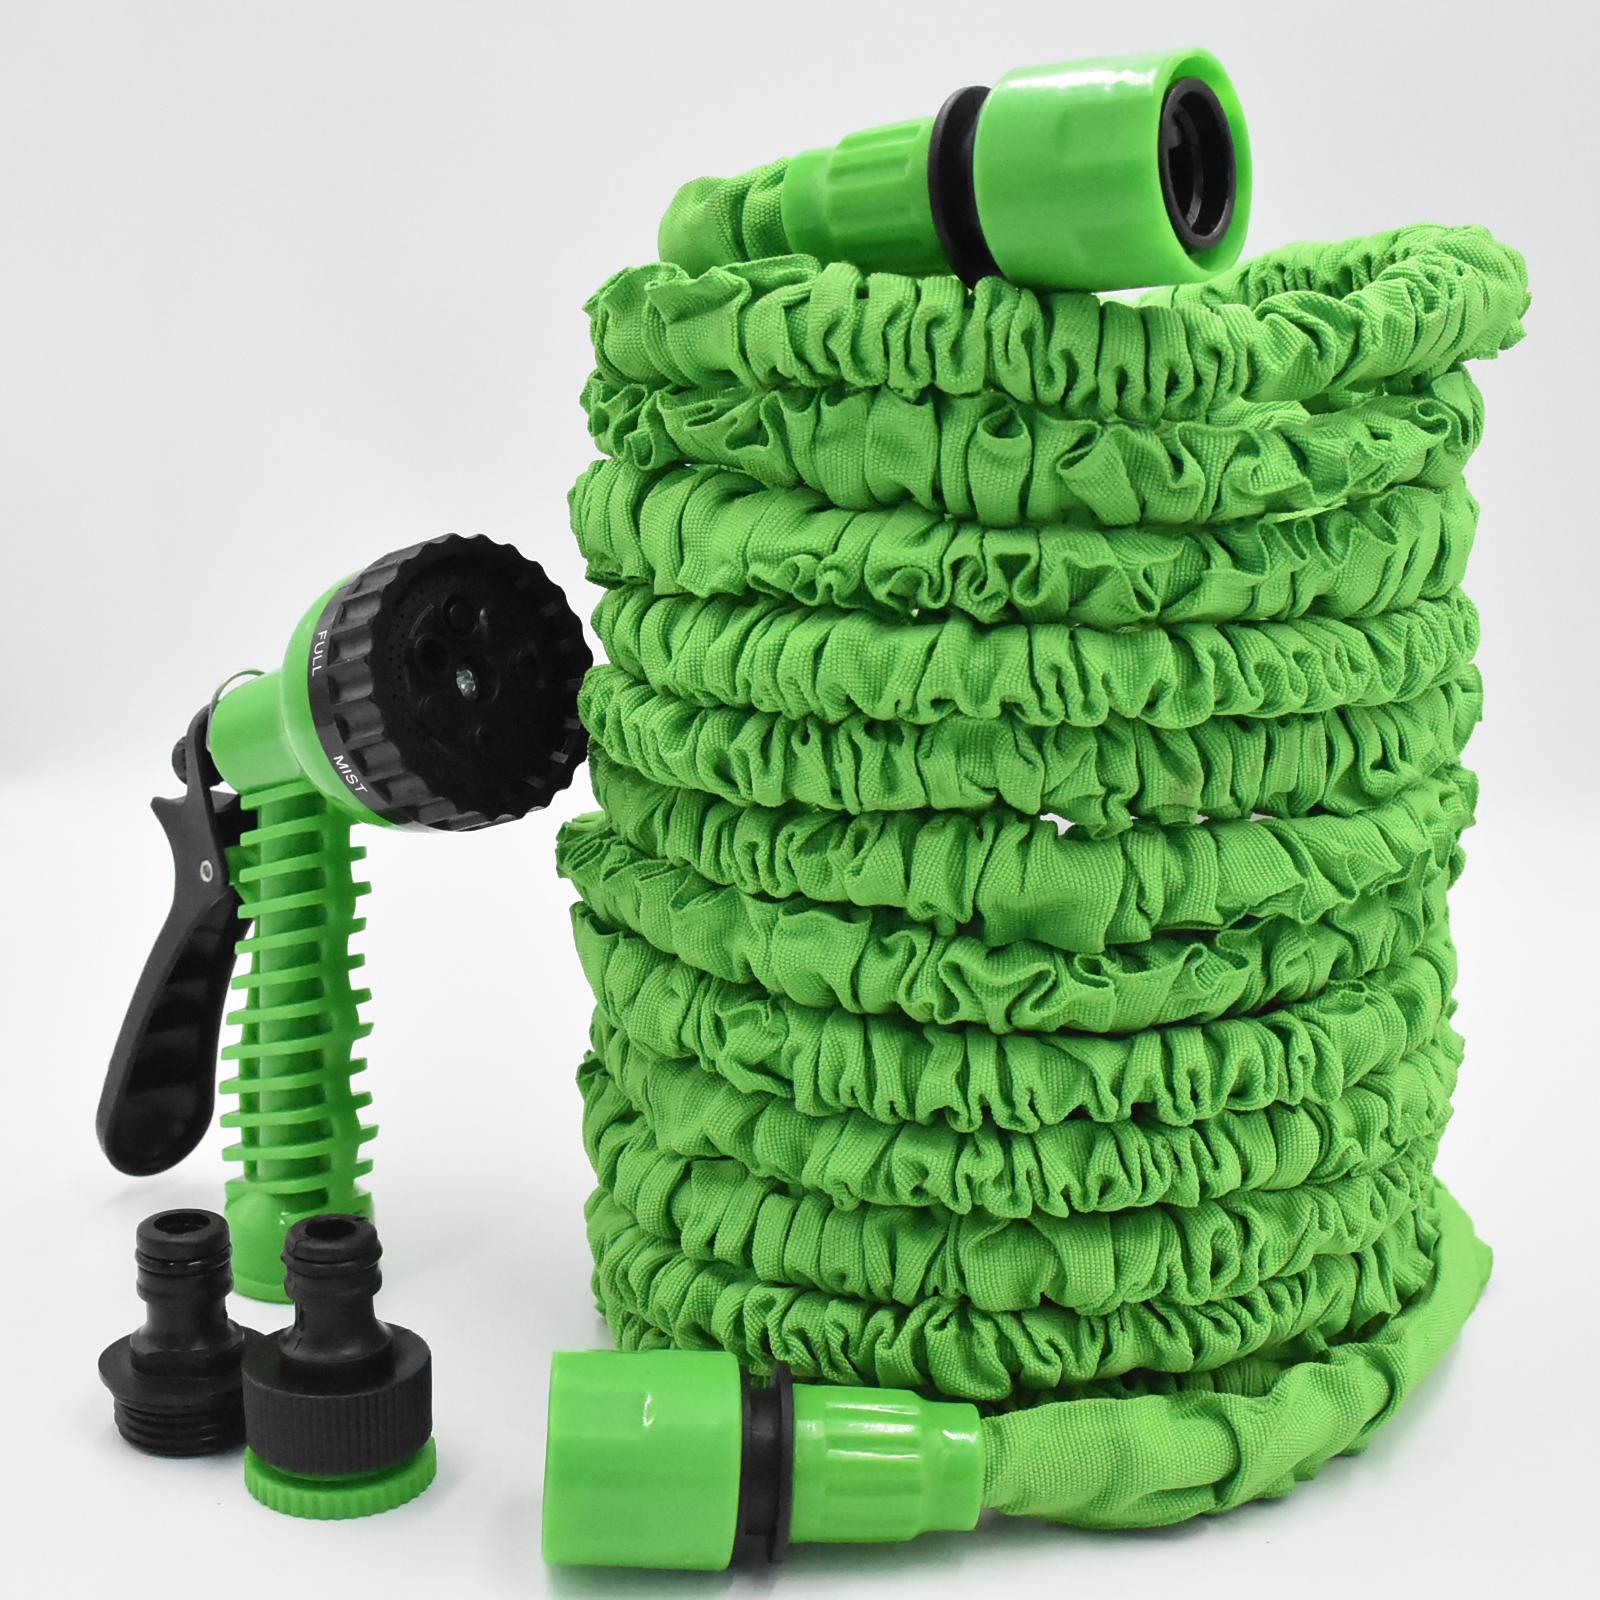 Quality expandable garden hose 50ft 75FT 100FT 150FT magic hose promotion high pressure snake garden magic water hose